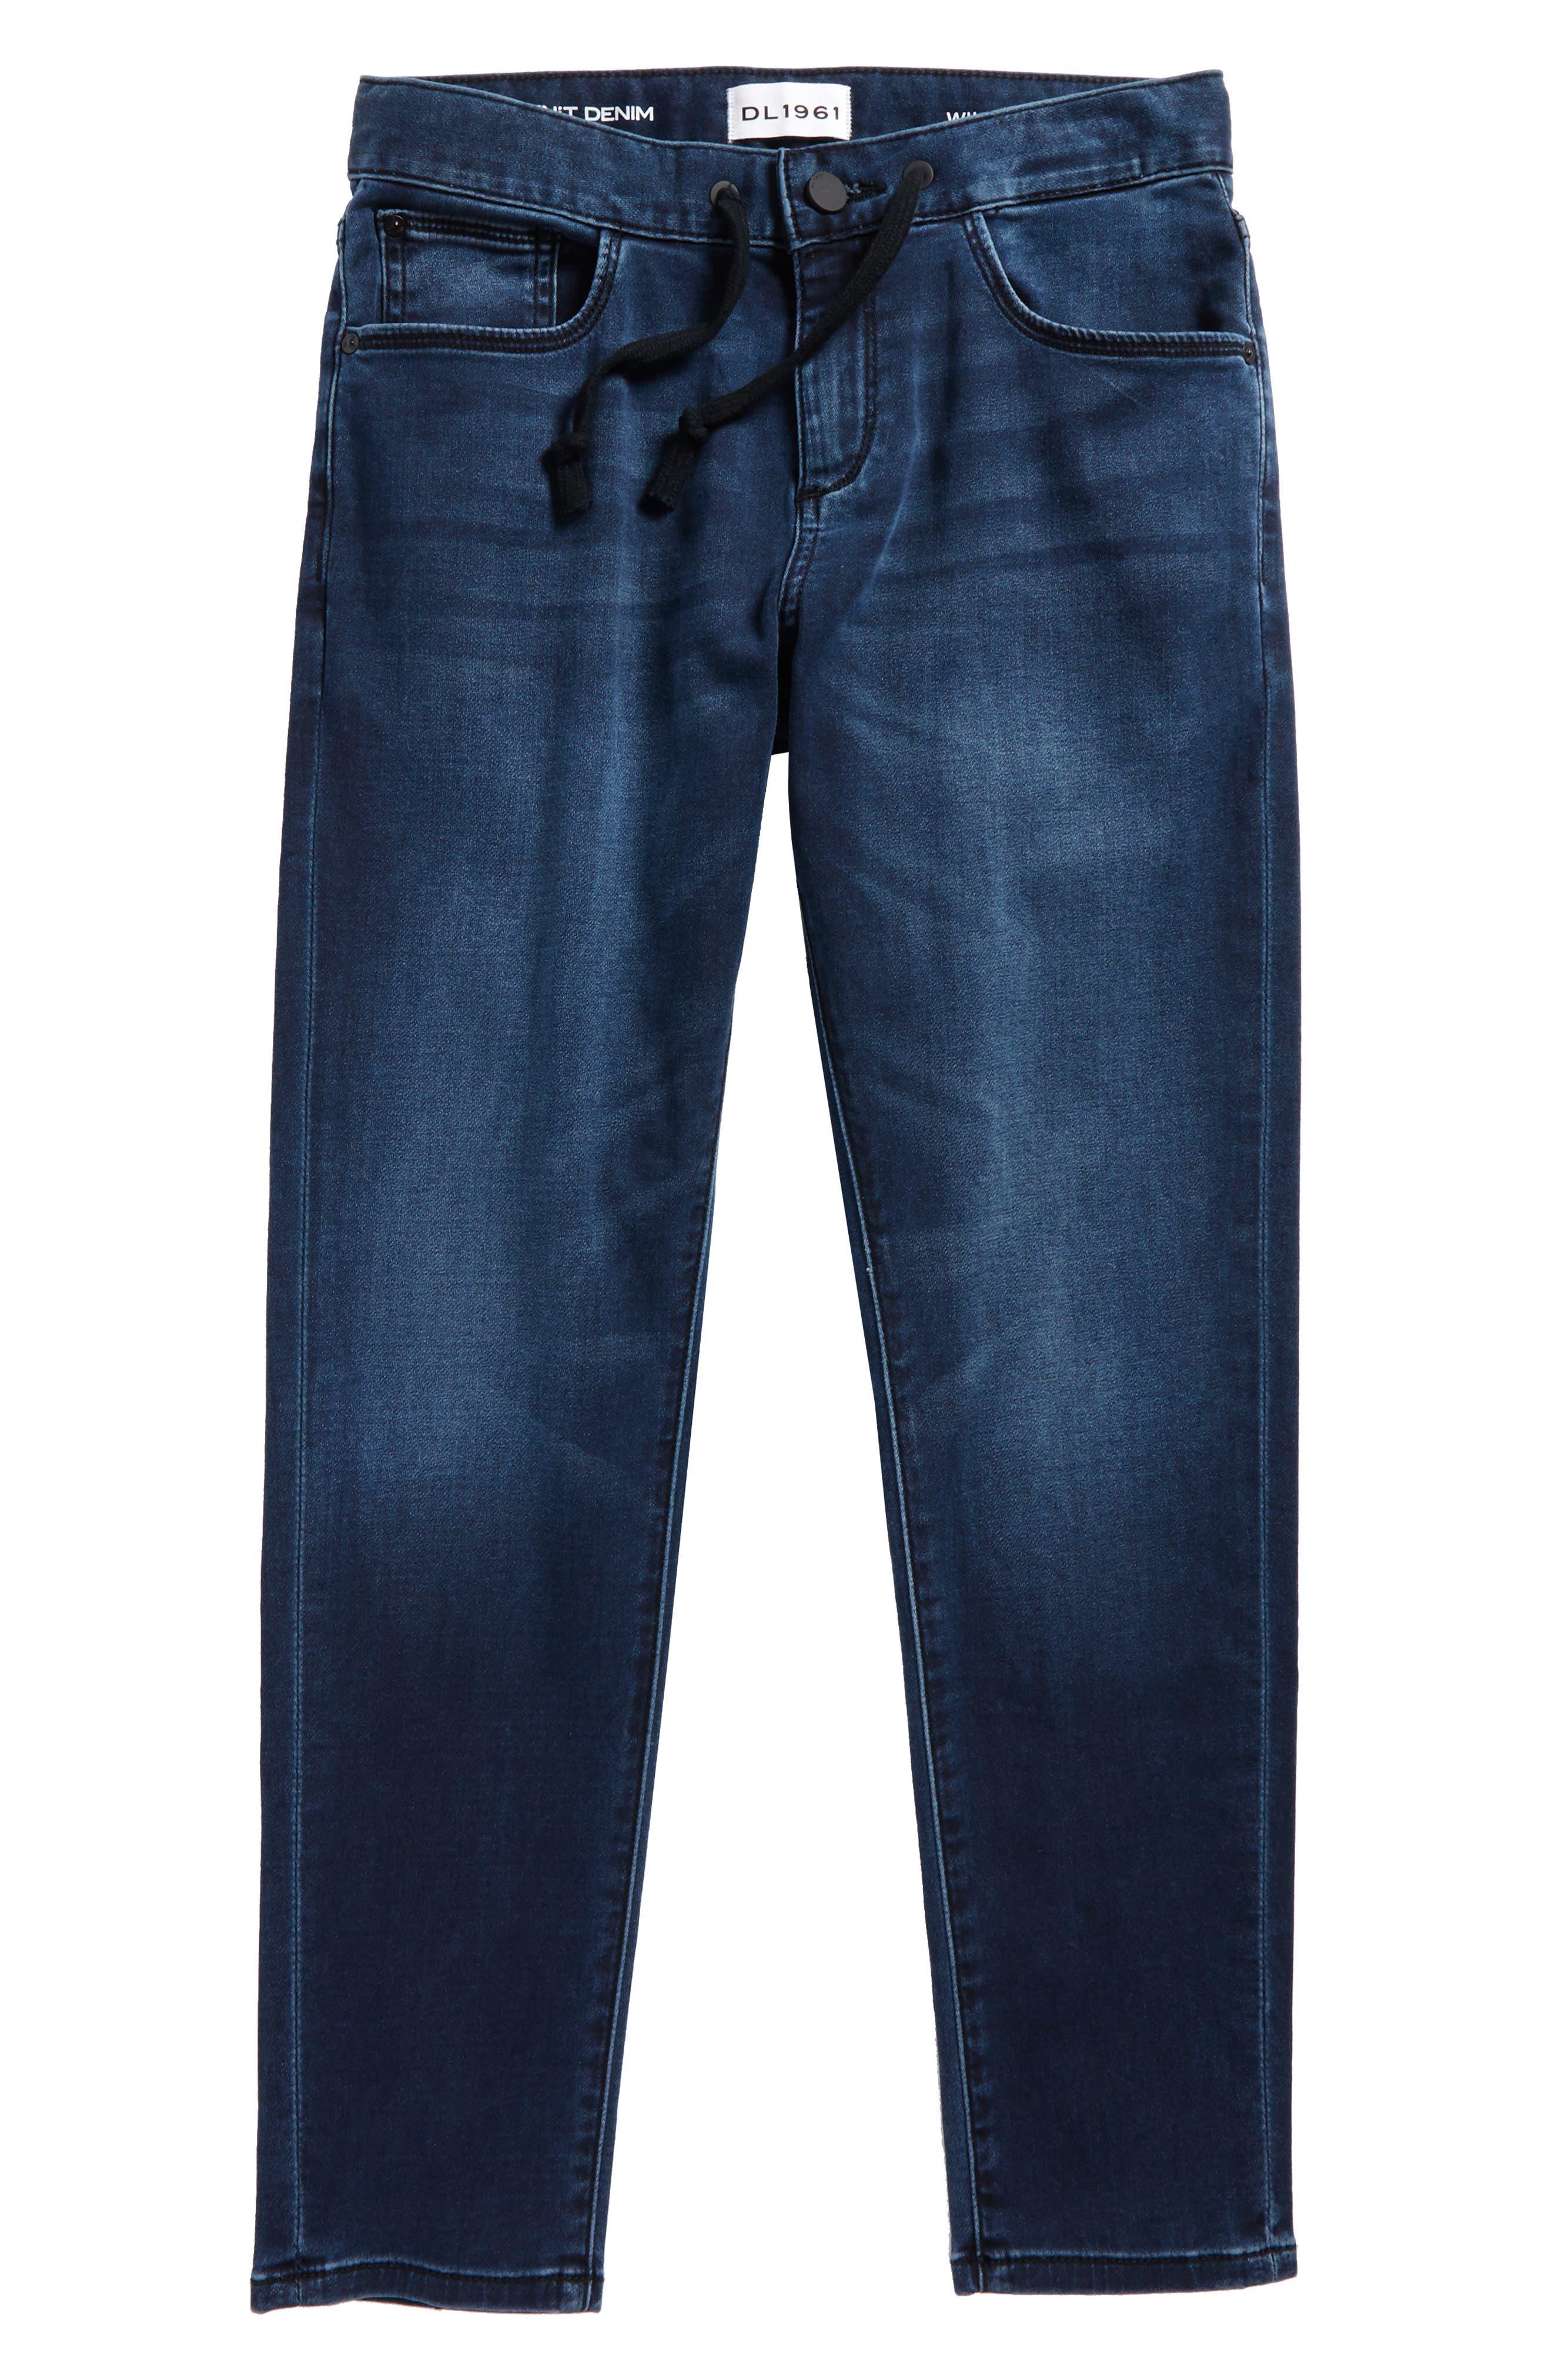 William Drawstring Jeans,                             Main thumbnail 1, color,                             RESERVE